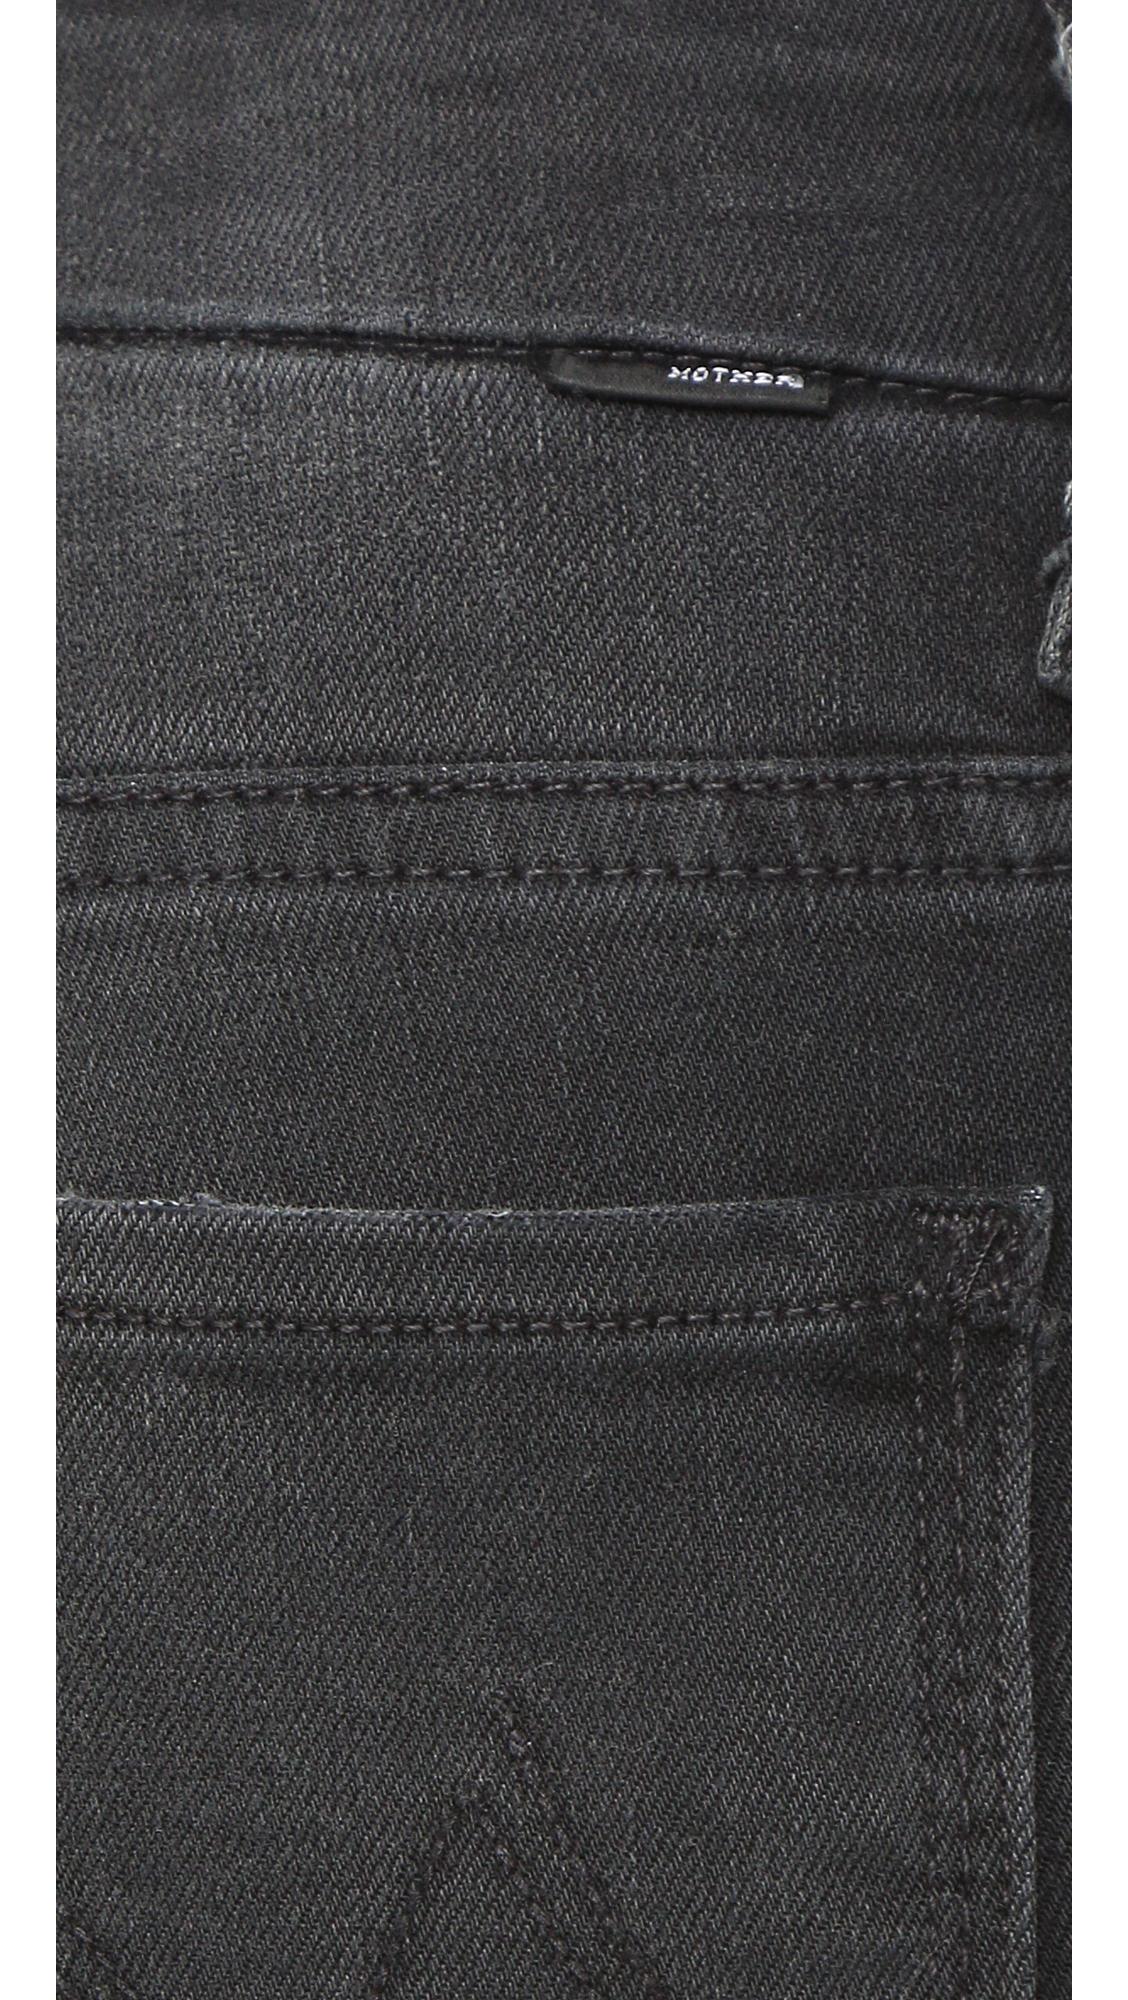 Mother The High Waist Looker Jeans - Wait Until Dark in Black